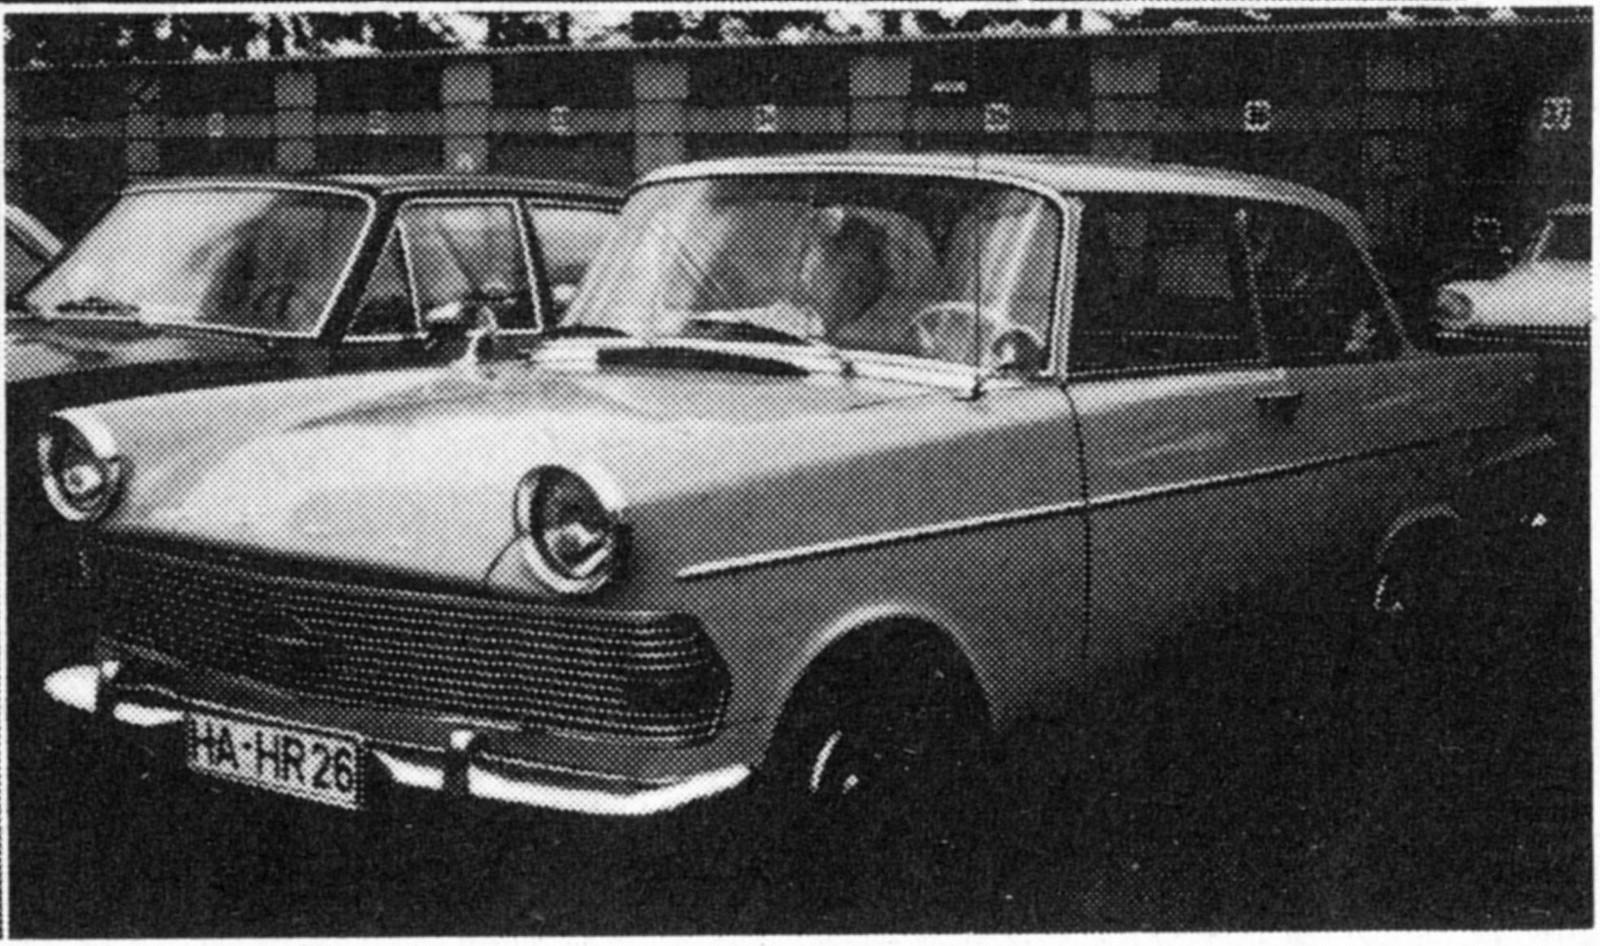 Startnummer 42 – Opel Olympia Rekord 1961